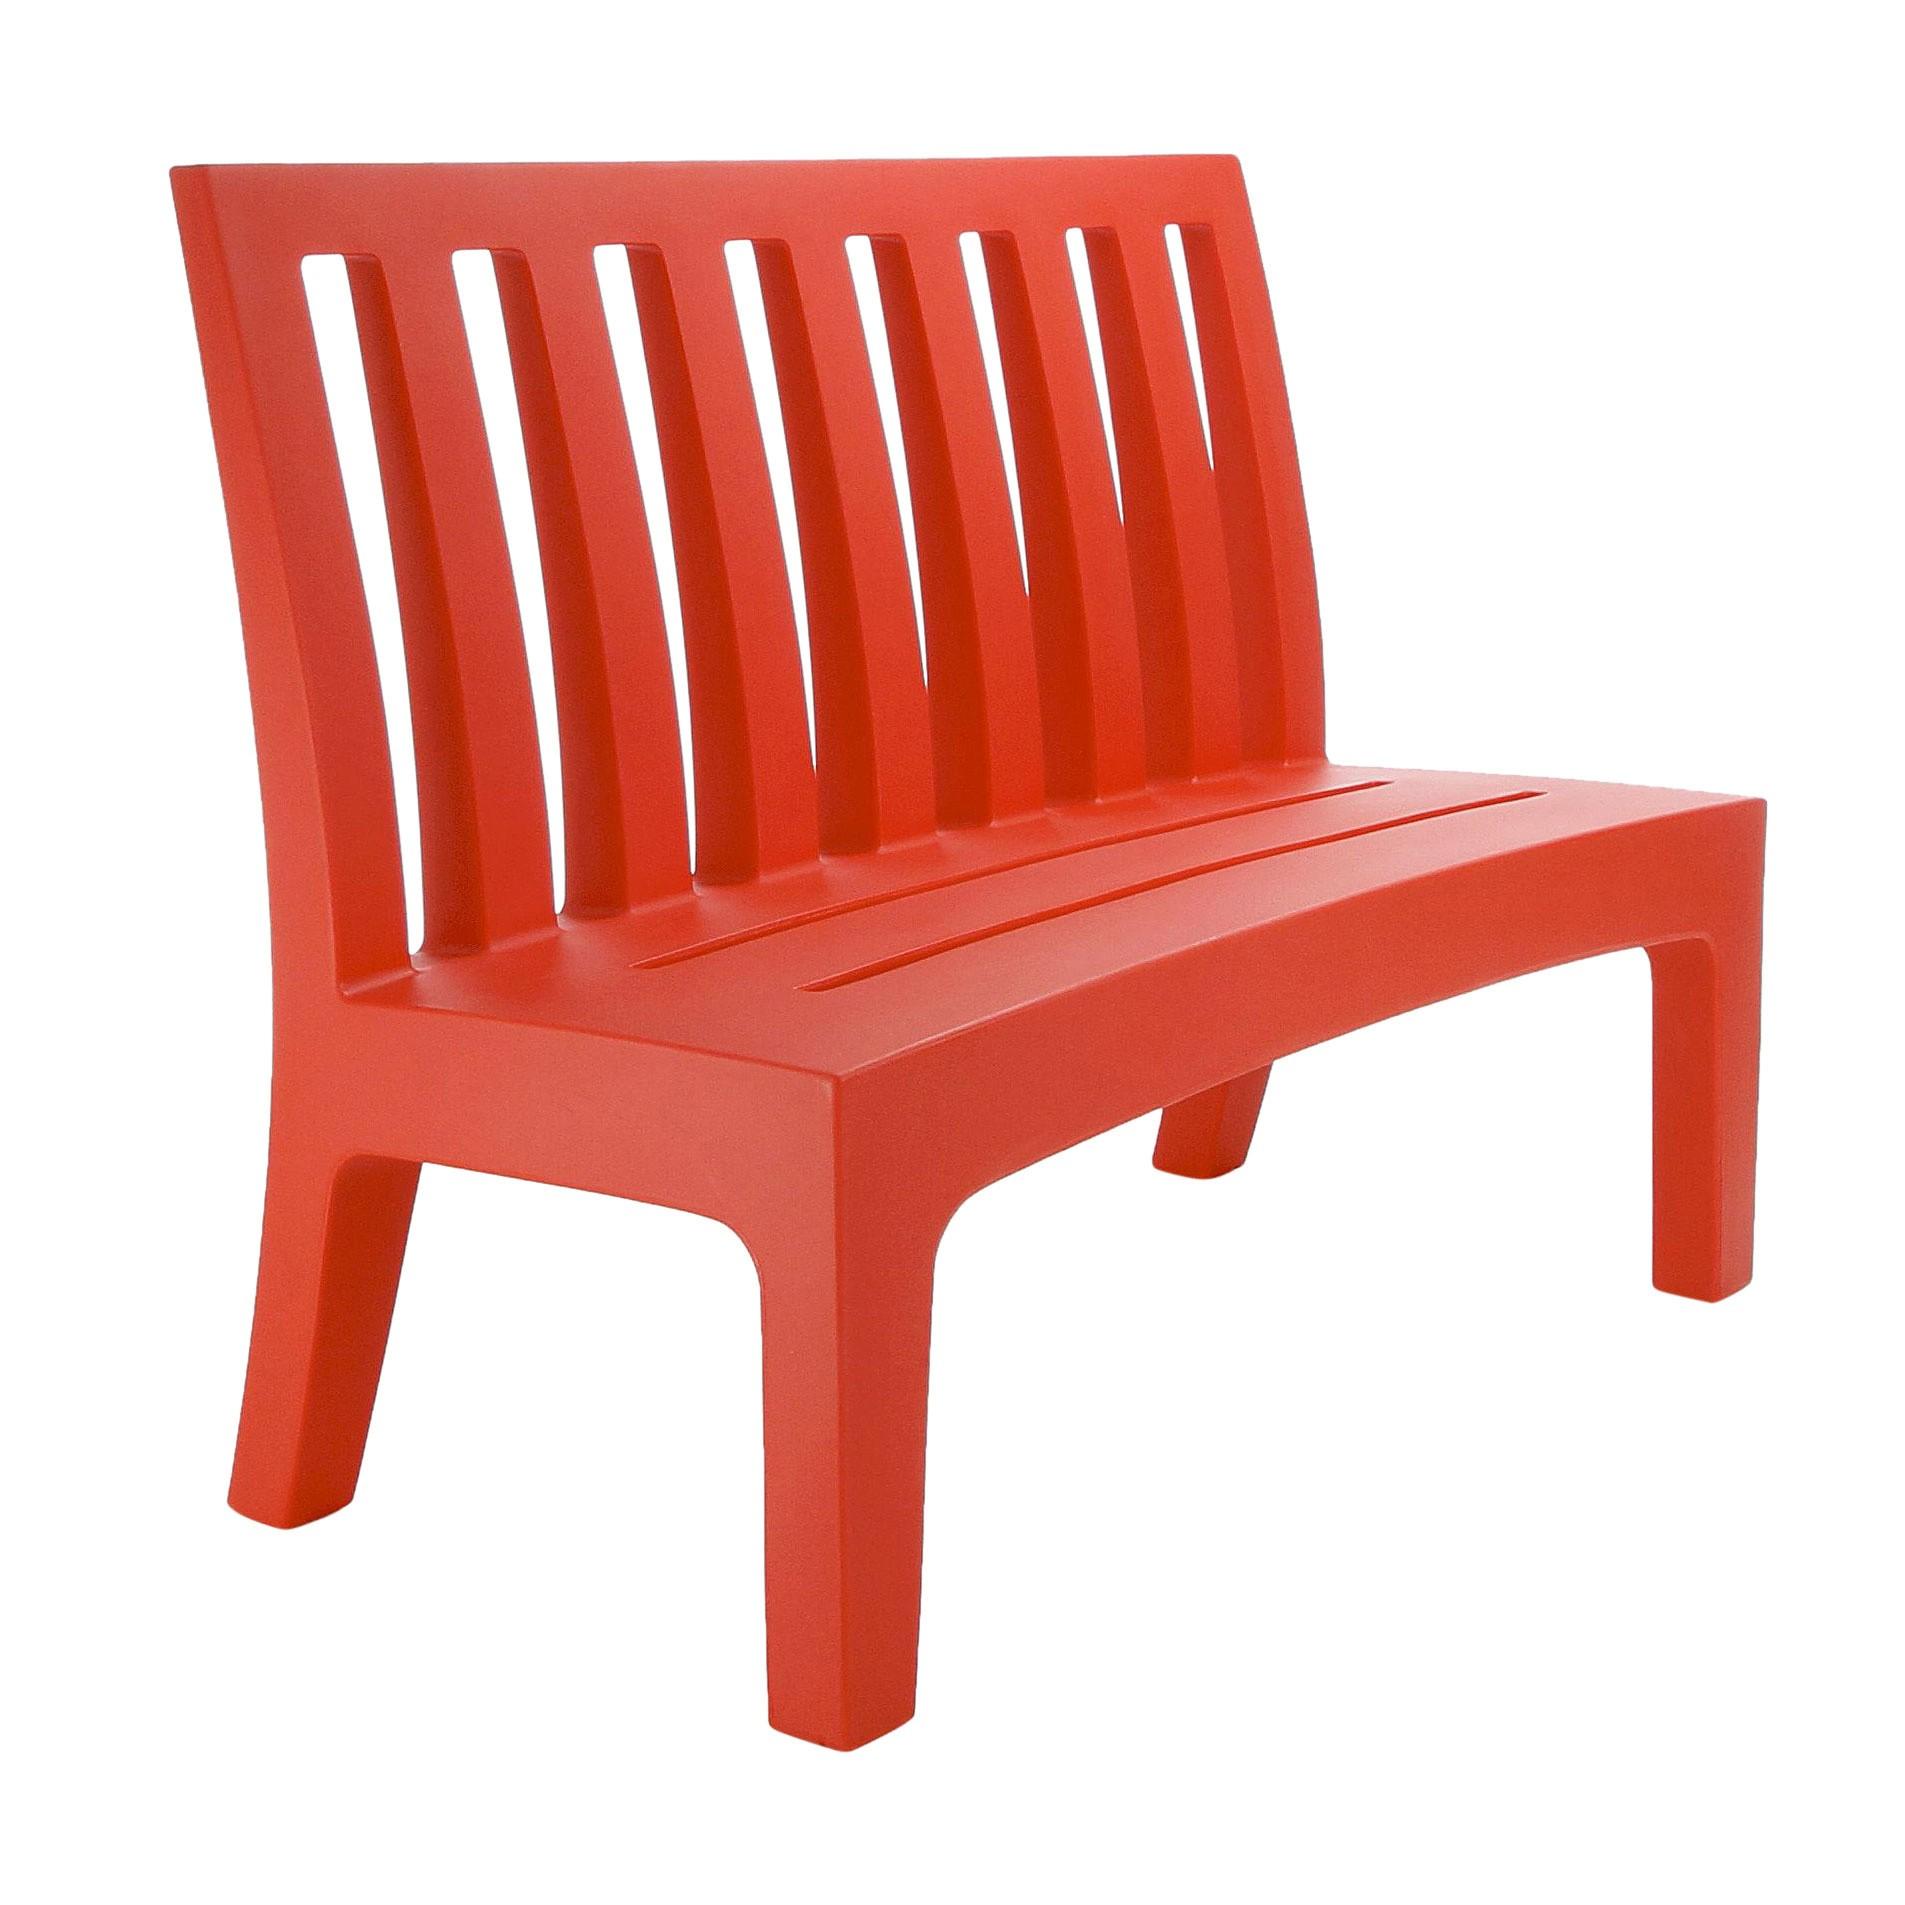 Sensational Romeo Garden Bench Gamerscity Chair Design For Home Gamerscityorg